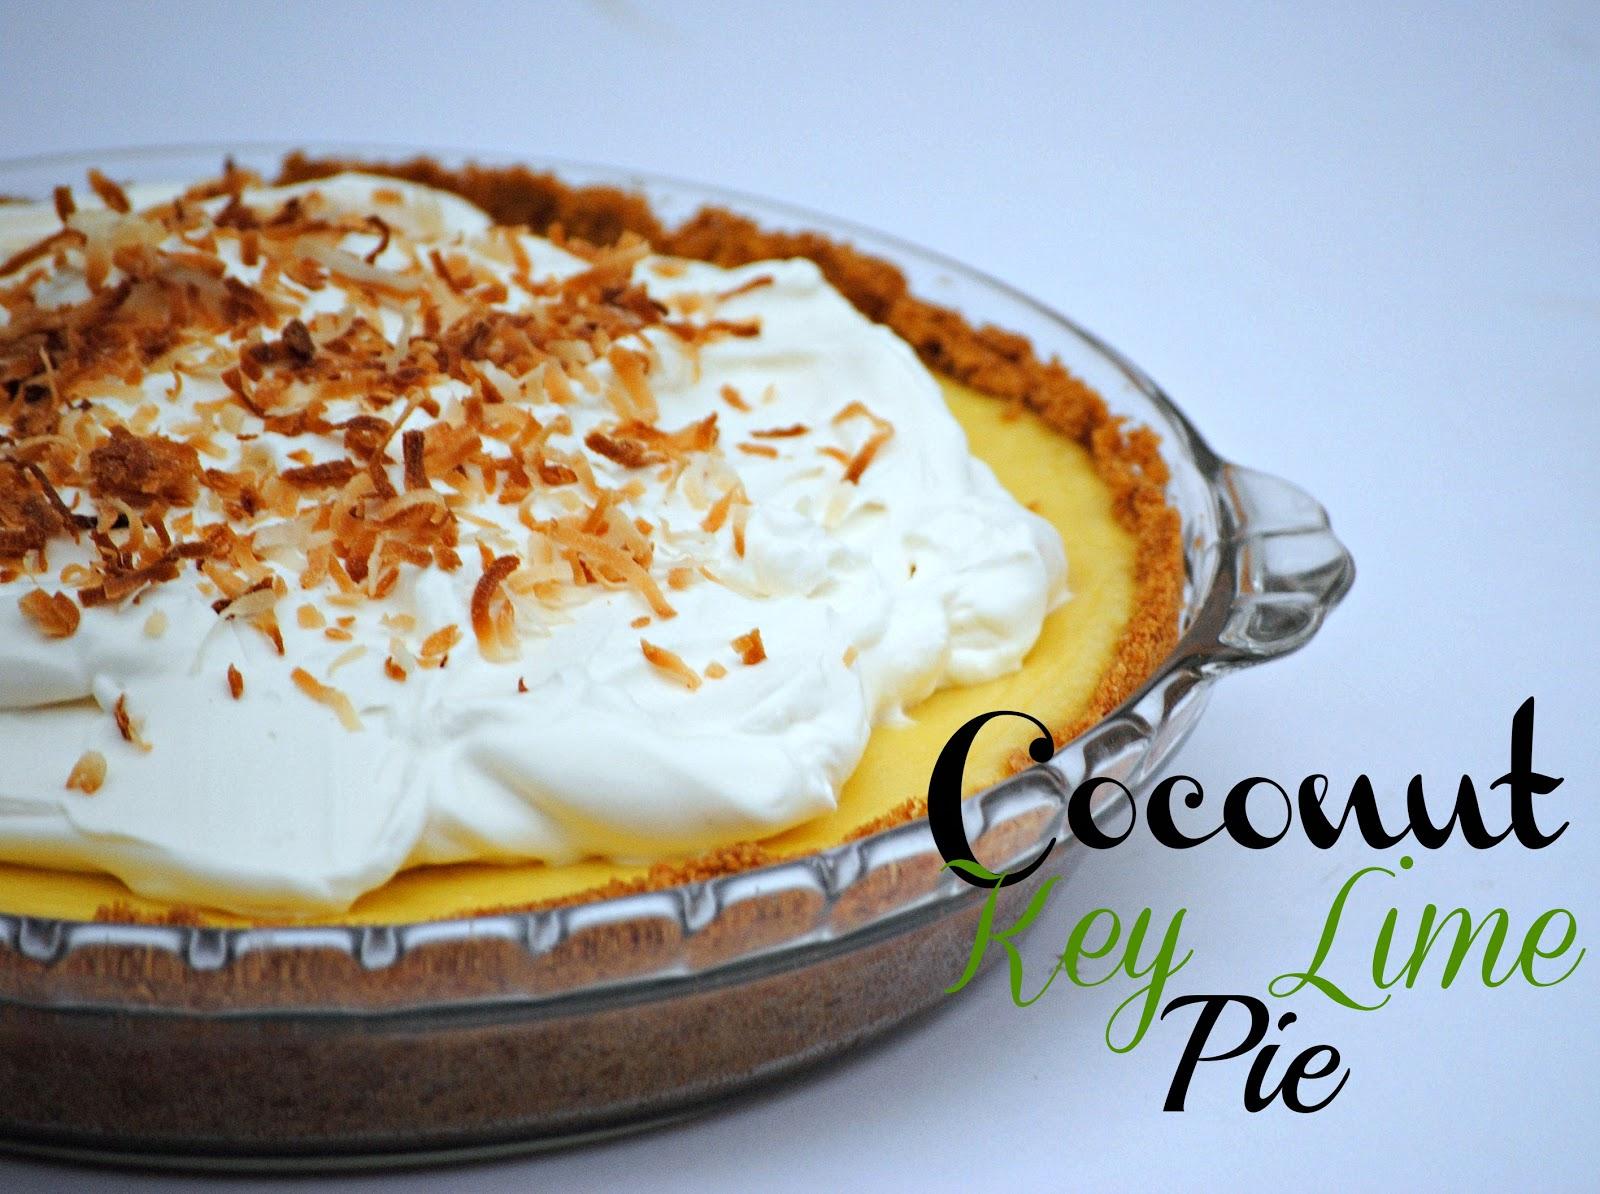 The Farm Girl Recipes: Coconut Key Lime Pie